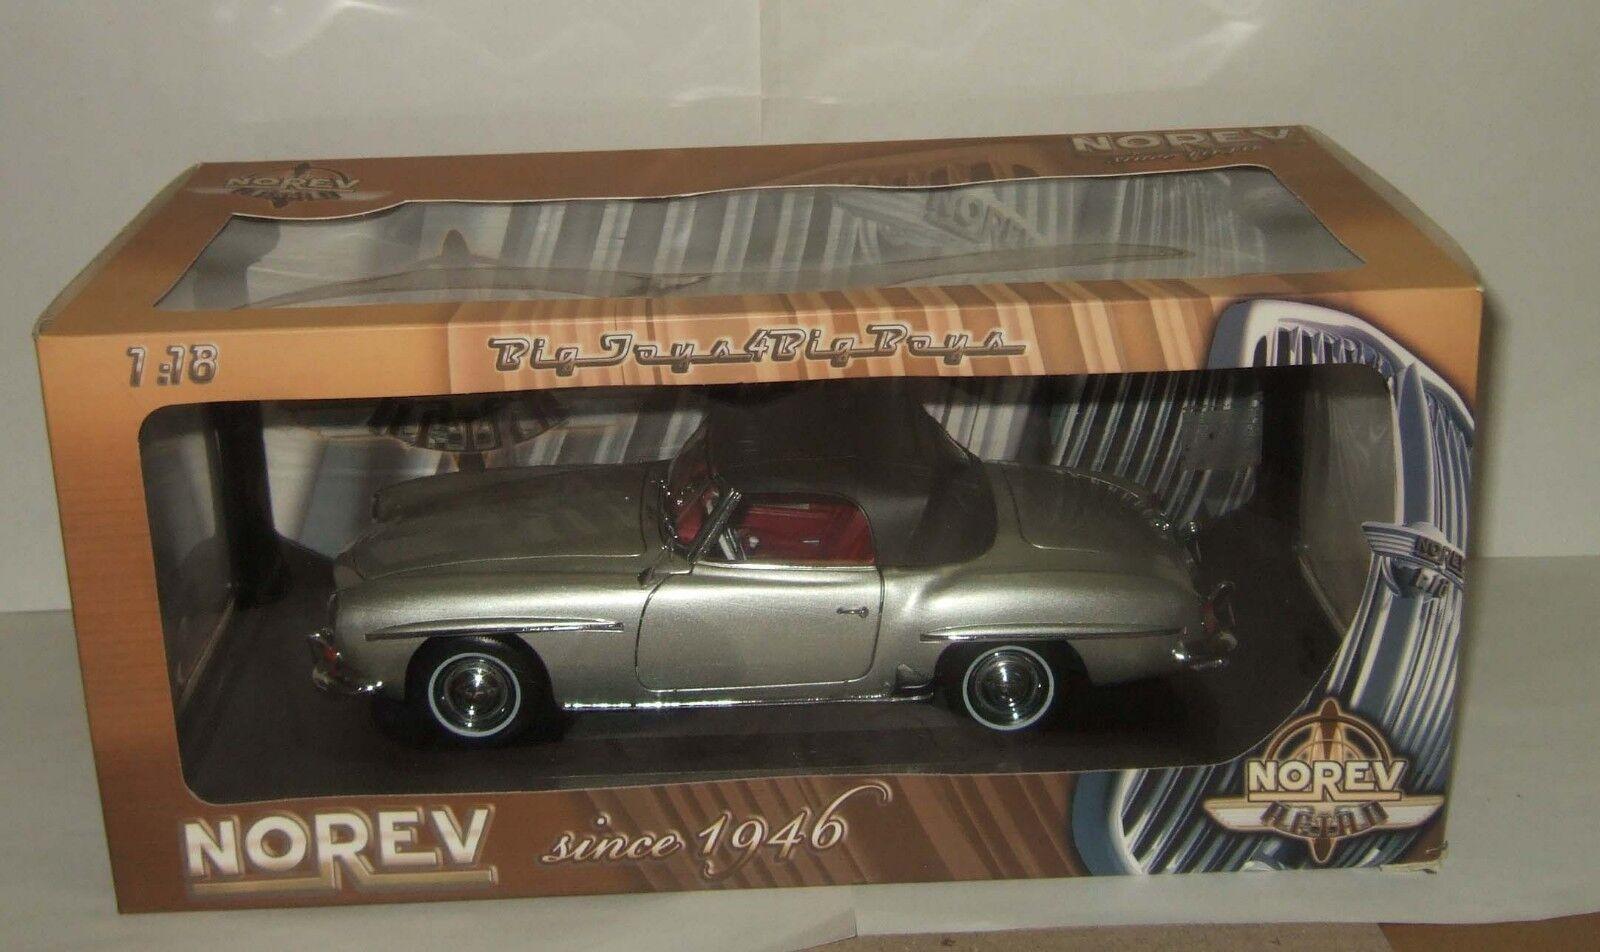 alta calidad 1 18 Norev Mercedes Benz 190 SL SL SL W121 Plata 1956 Rara  mas preferencial